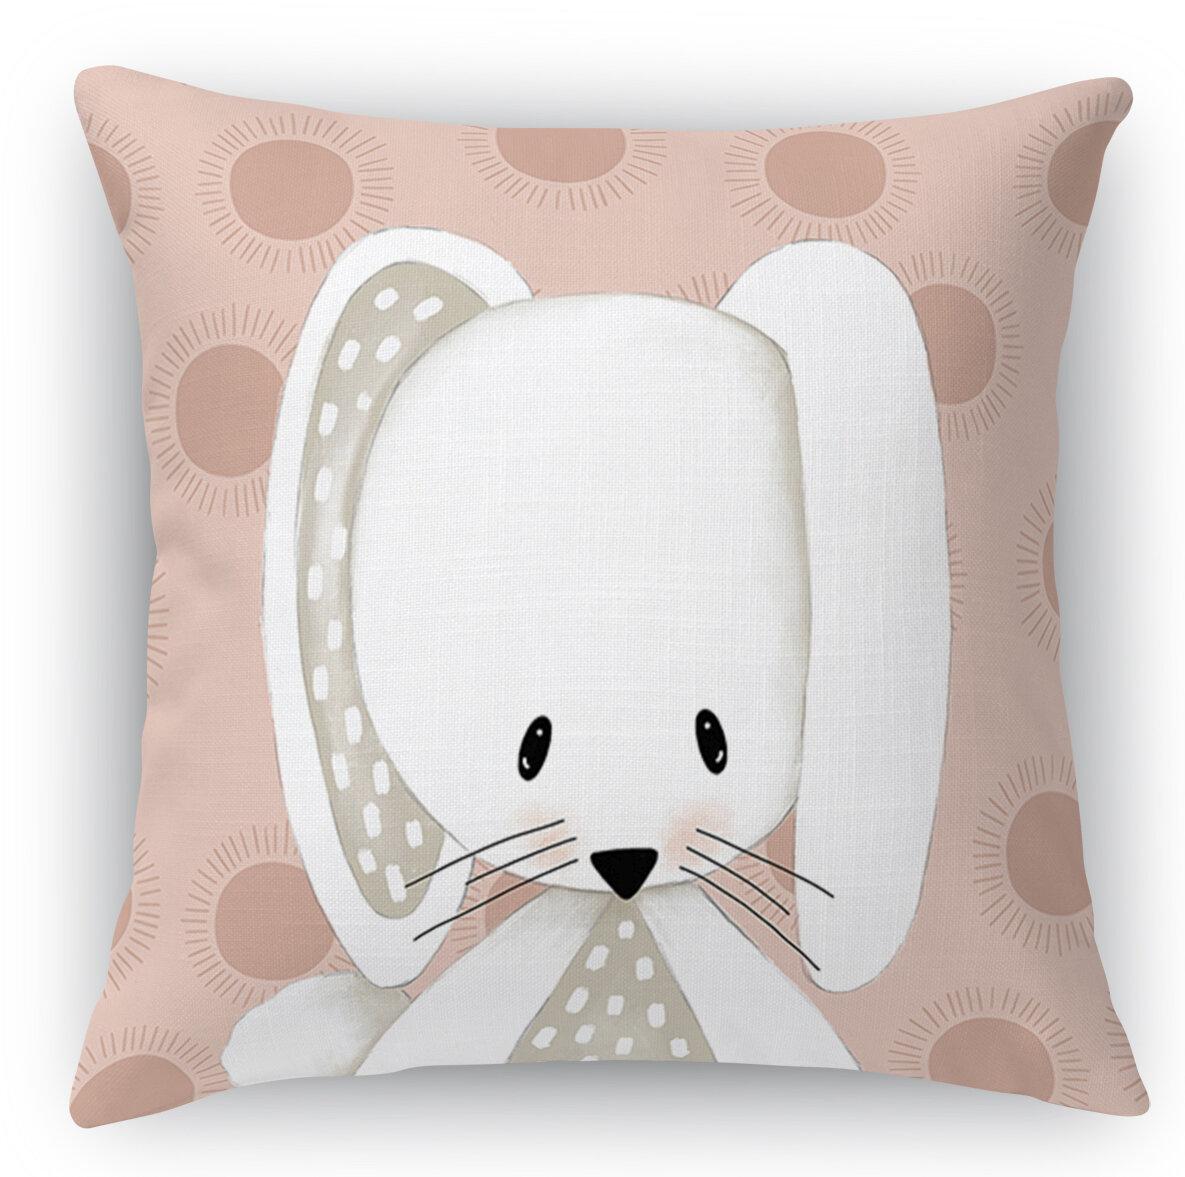 18 Square Polka Dot Throw Pillows You Ll Love In 2021 Wayfair